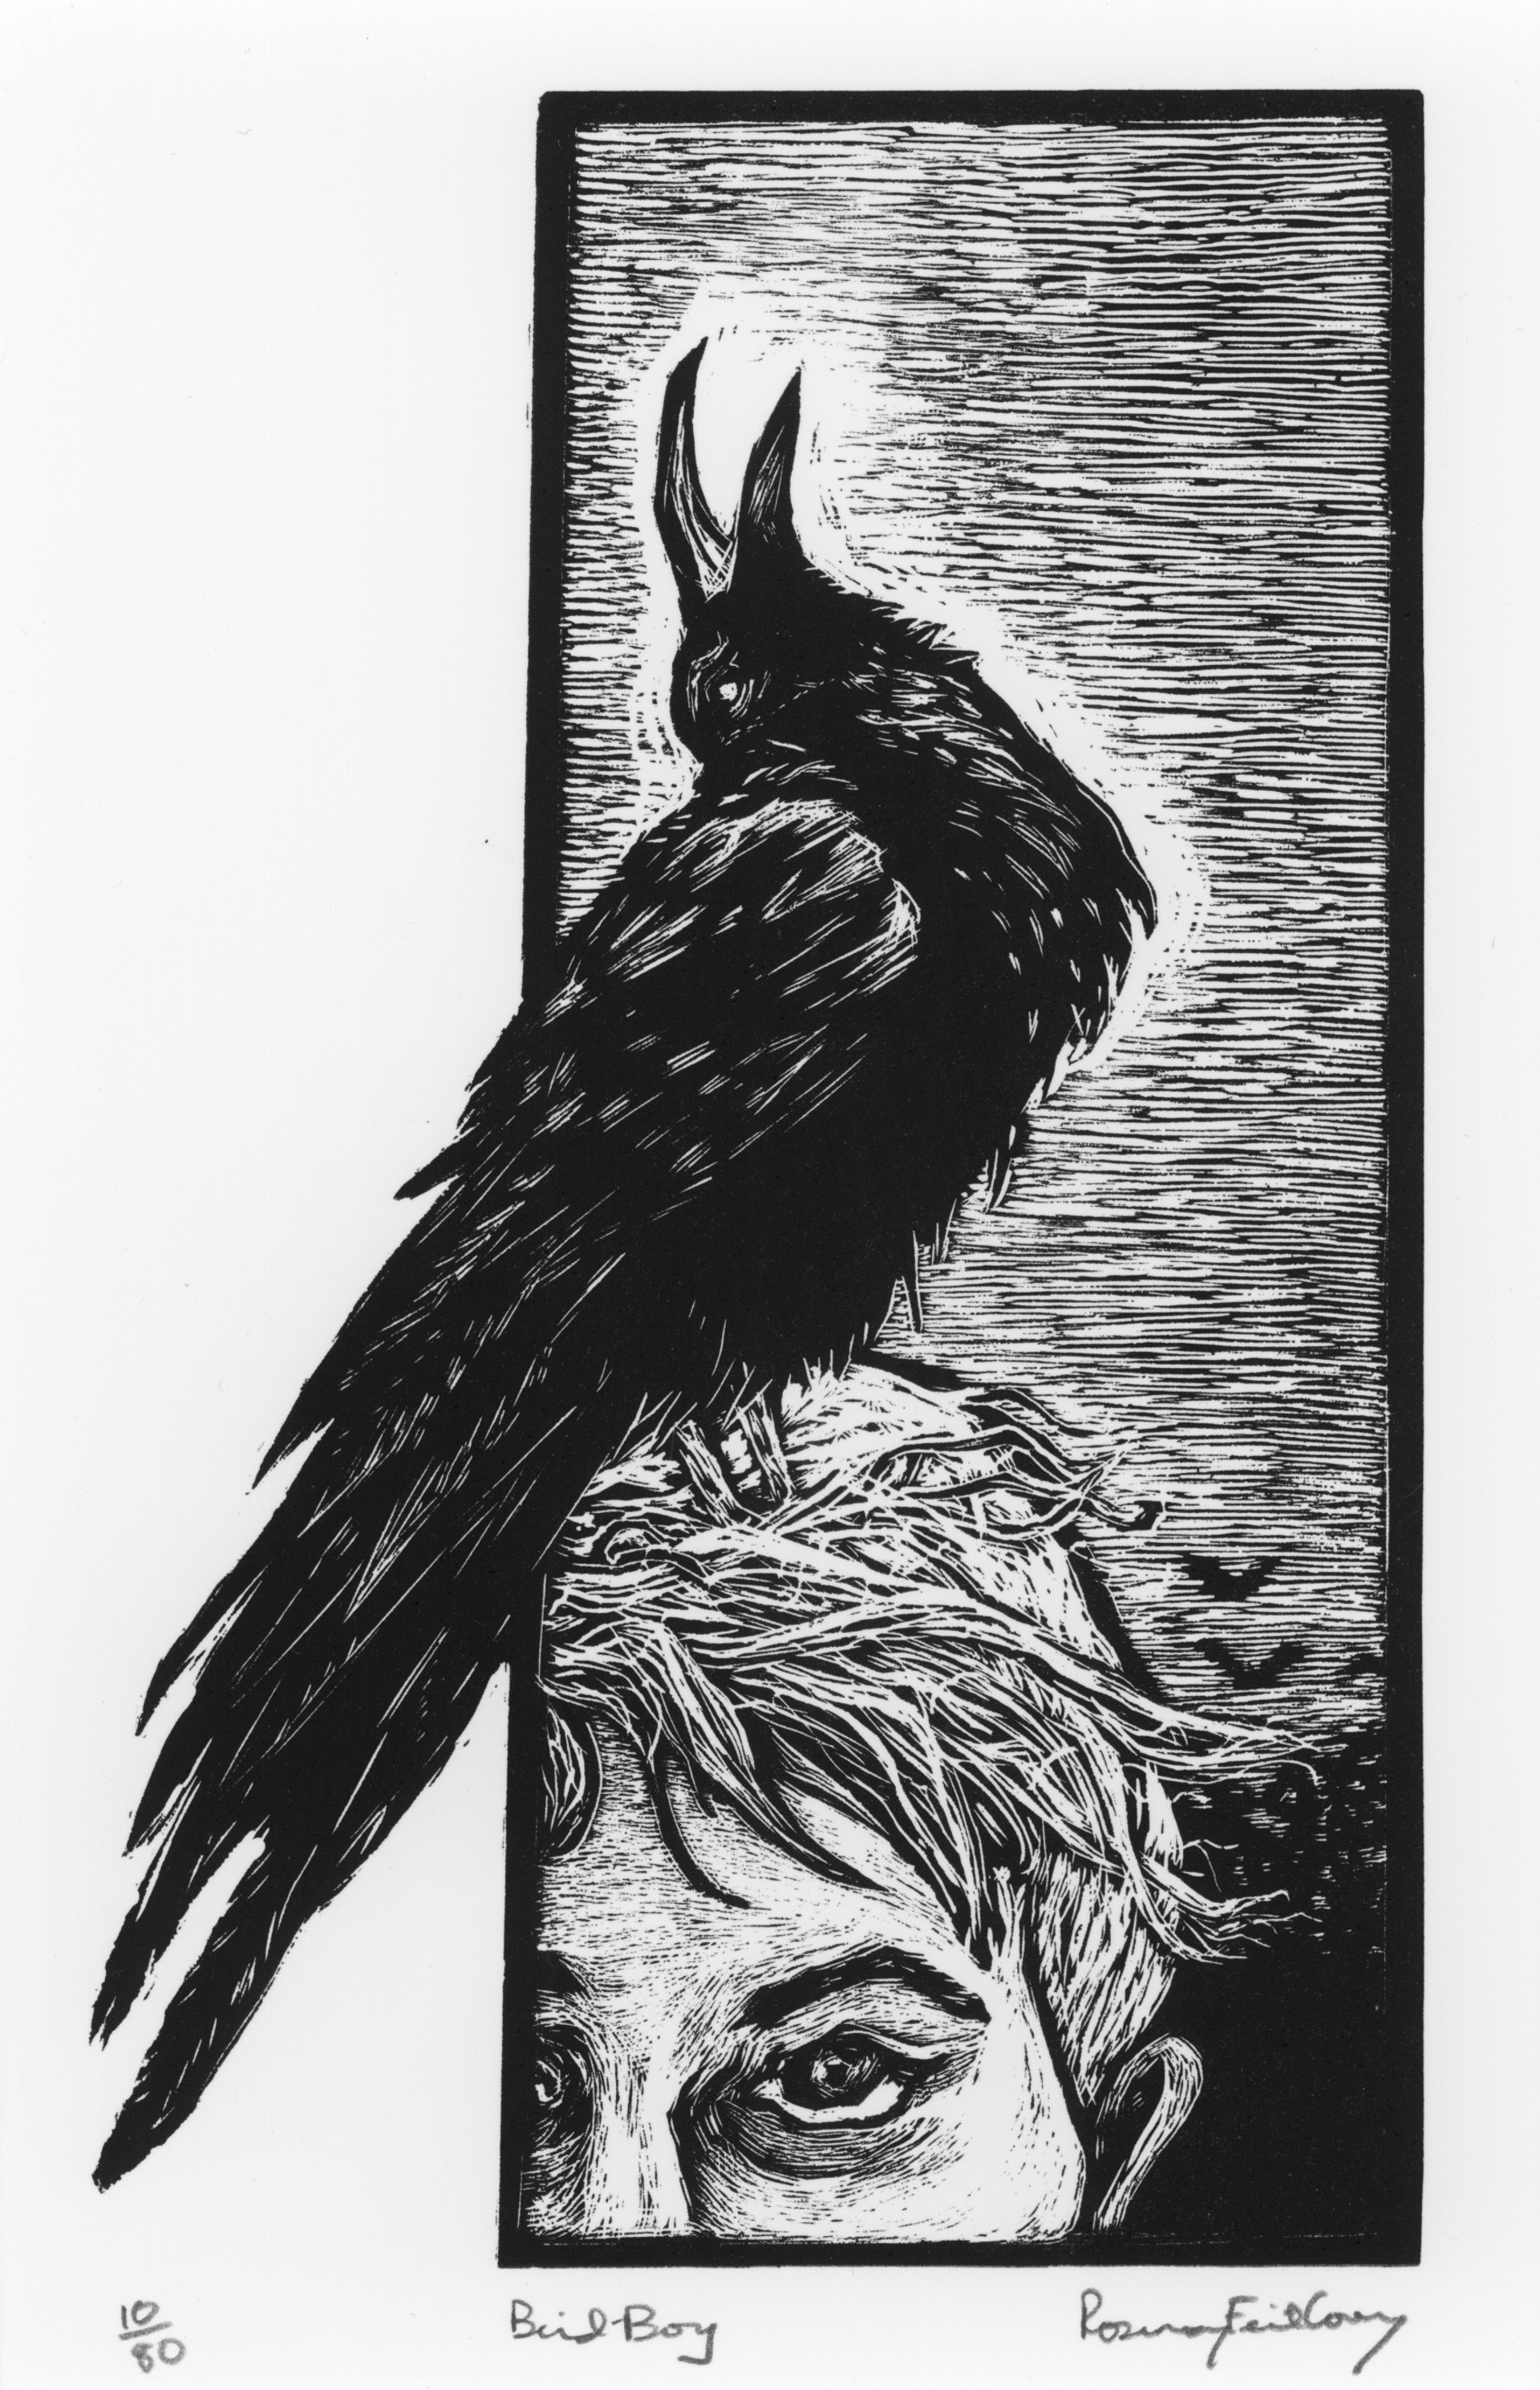 Bird Boy by Rosemary Feit Covey